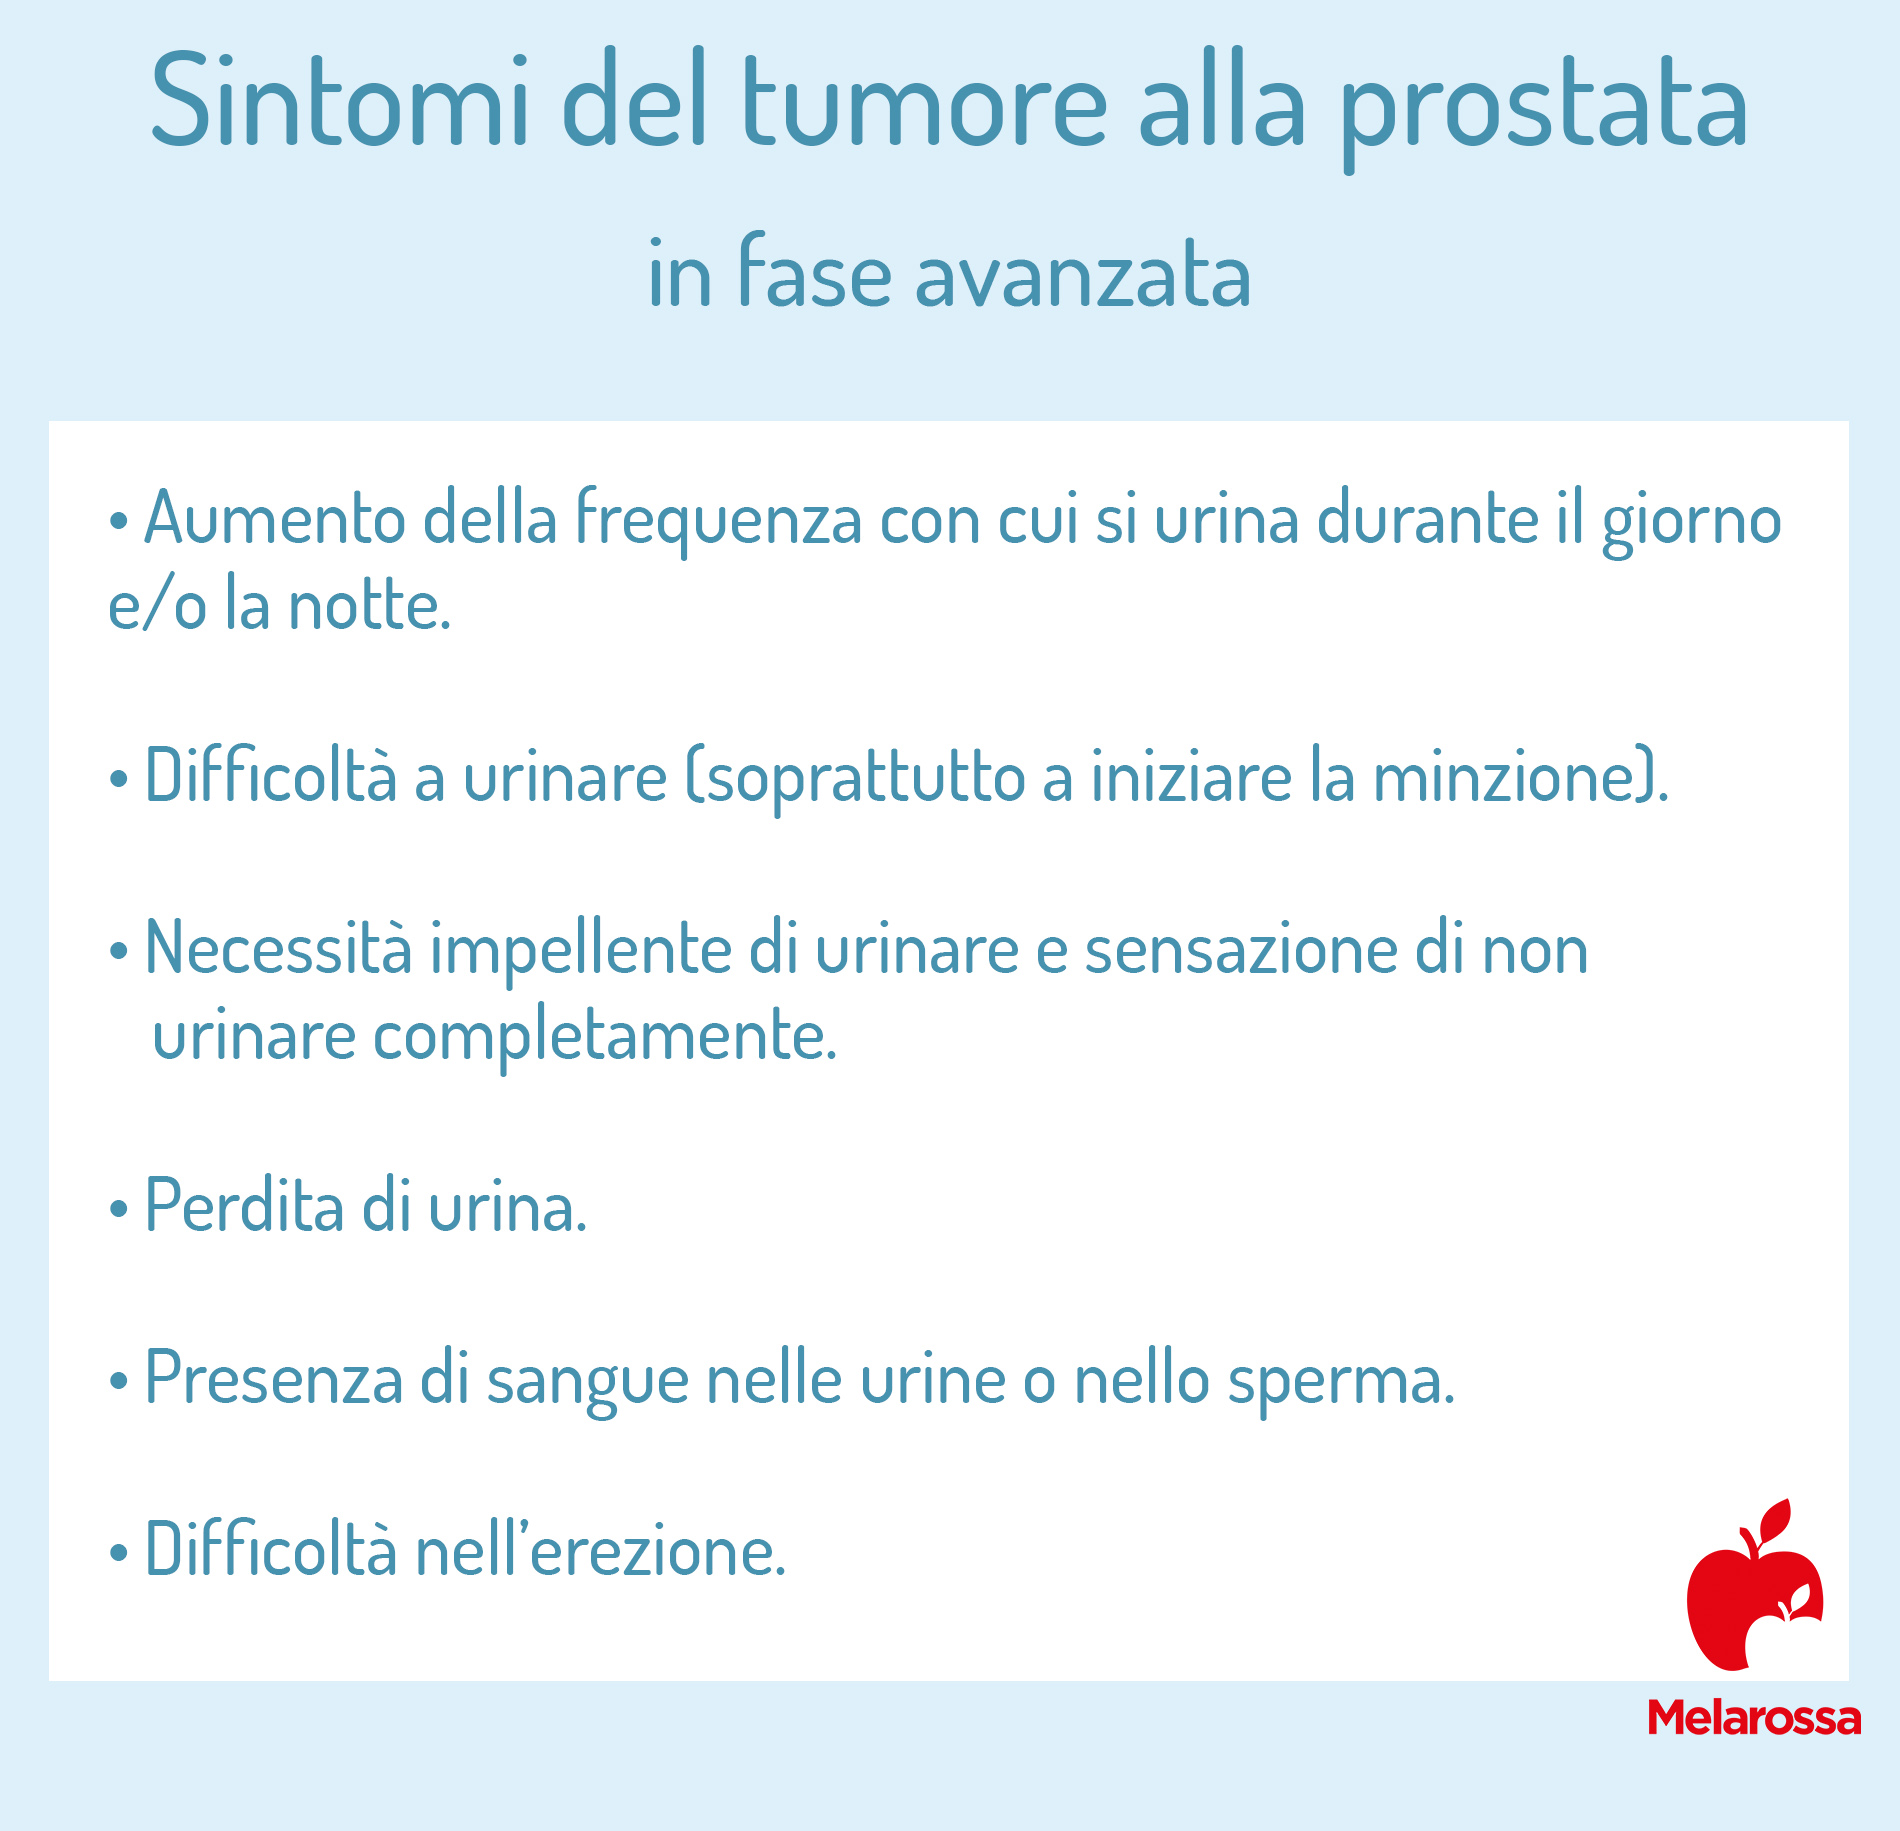 tumore alla prostata: sintomi